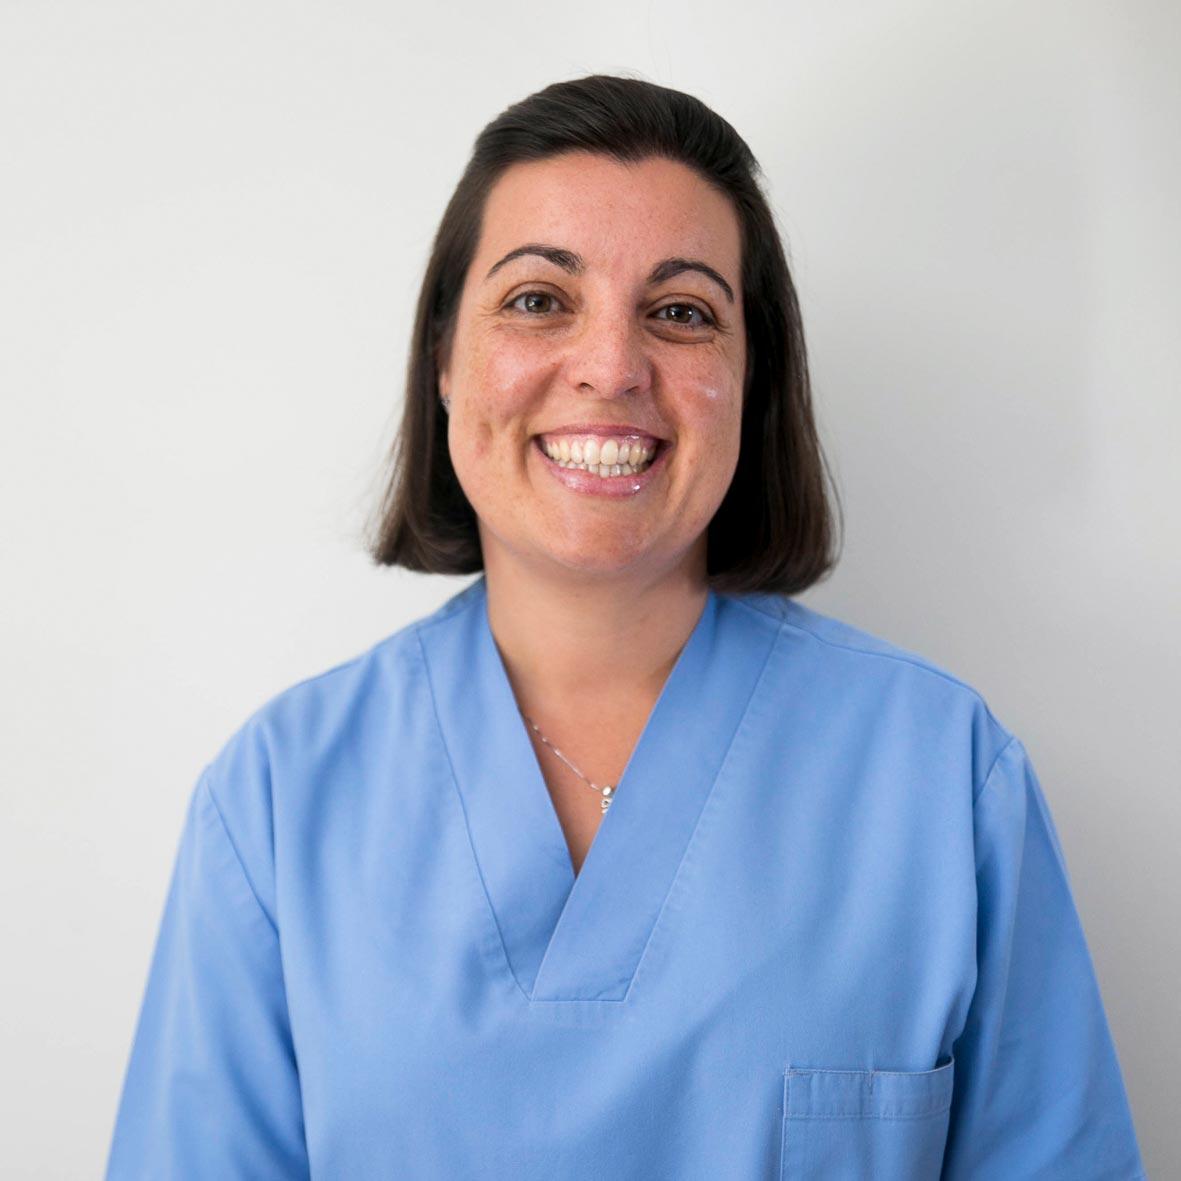 Carolina Cordero Rosales